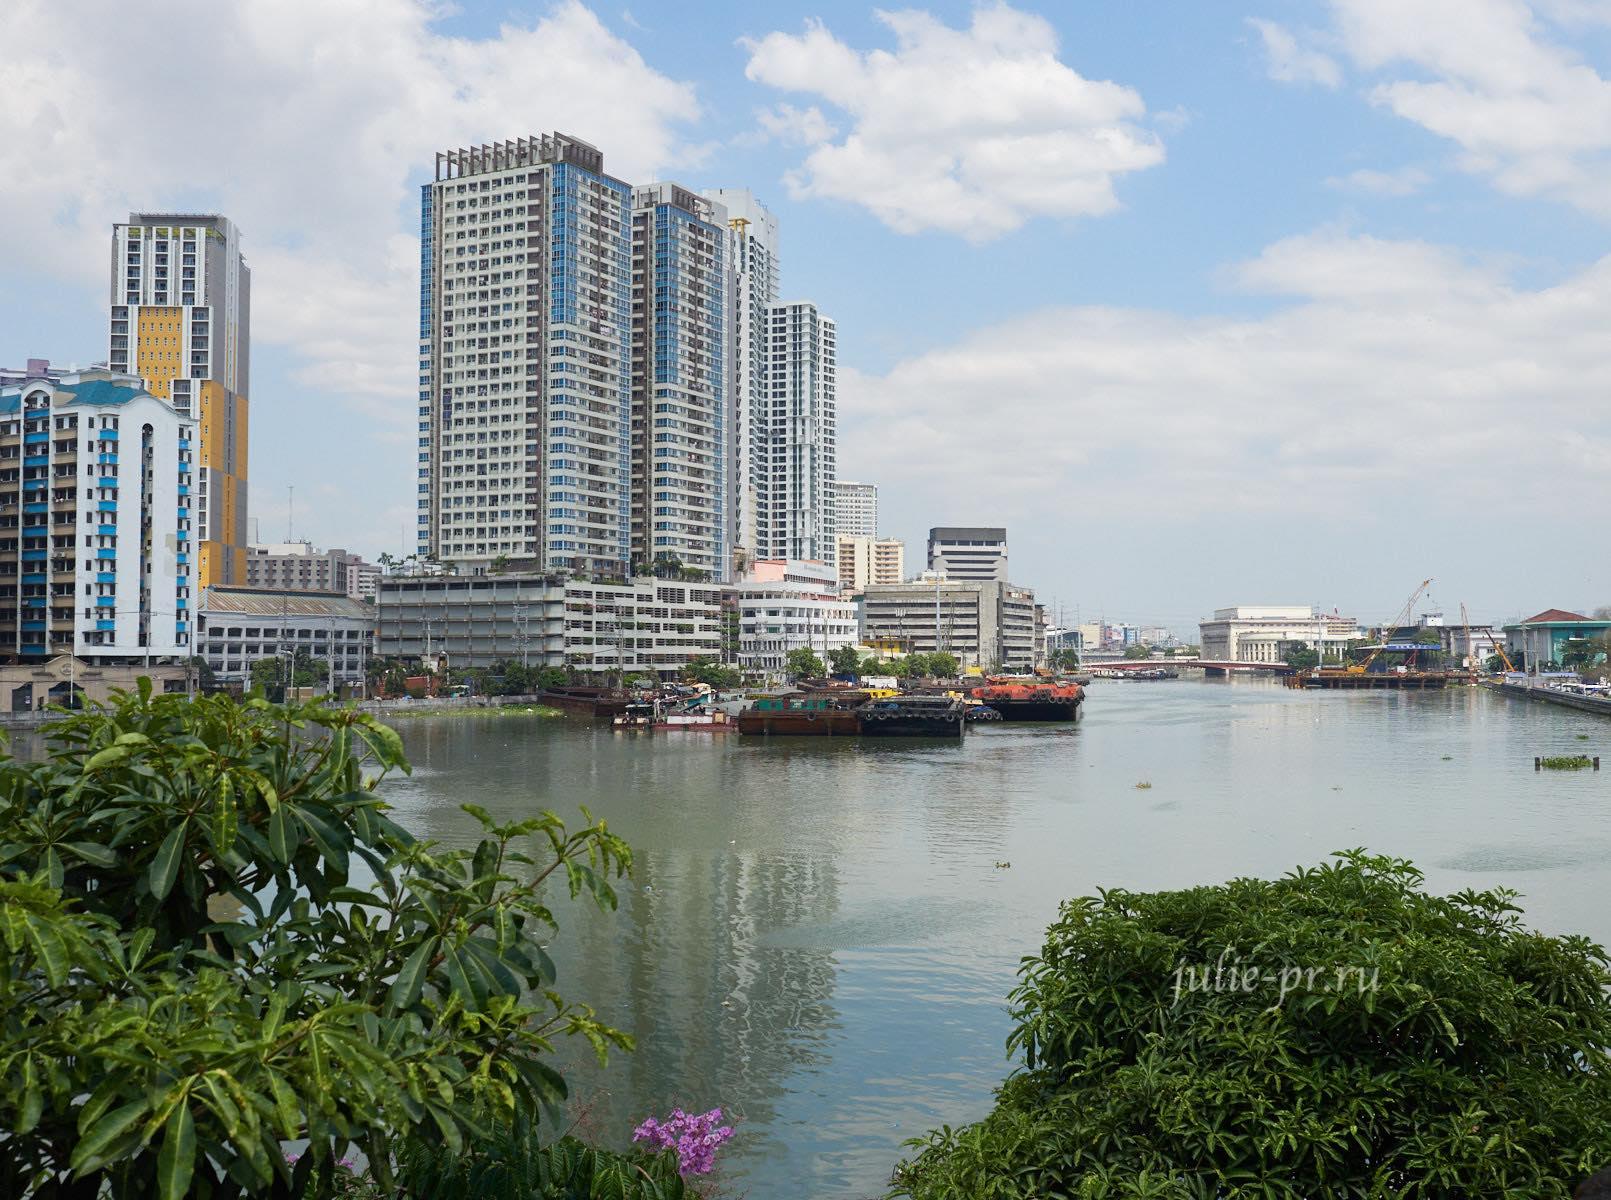 Филиппины, Манила, река Пасиг